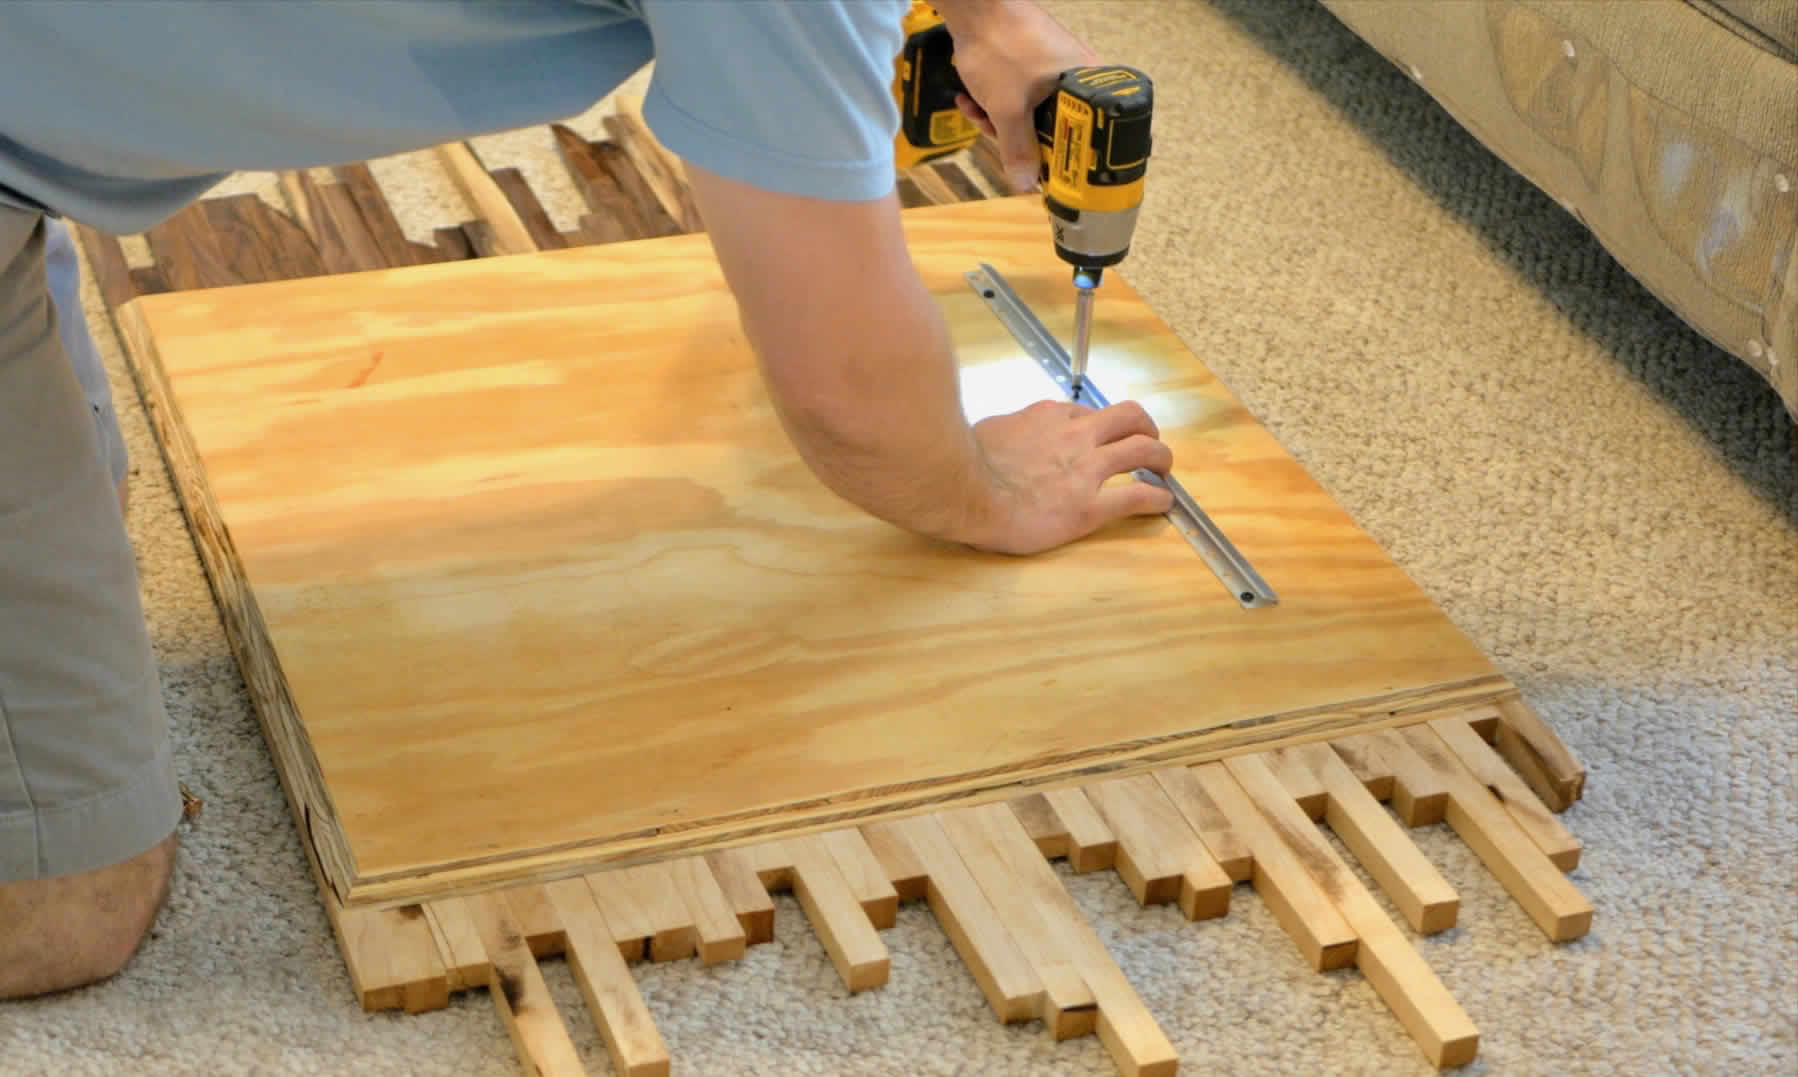 scrap-wood-wall-art-arrow-project-step7a.jpg